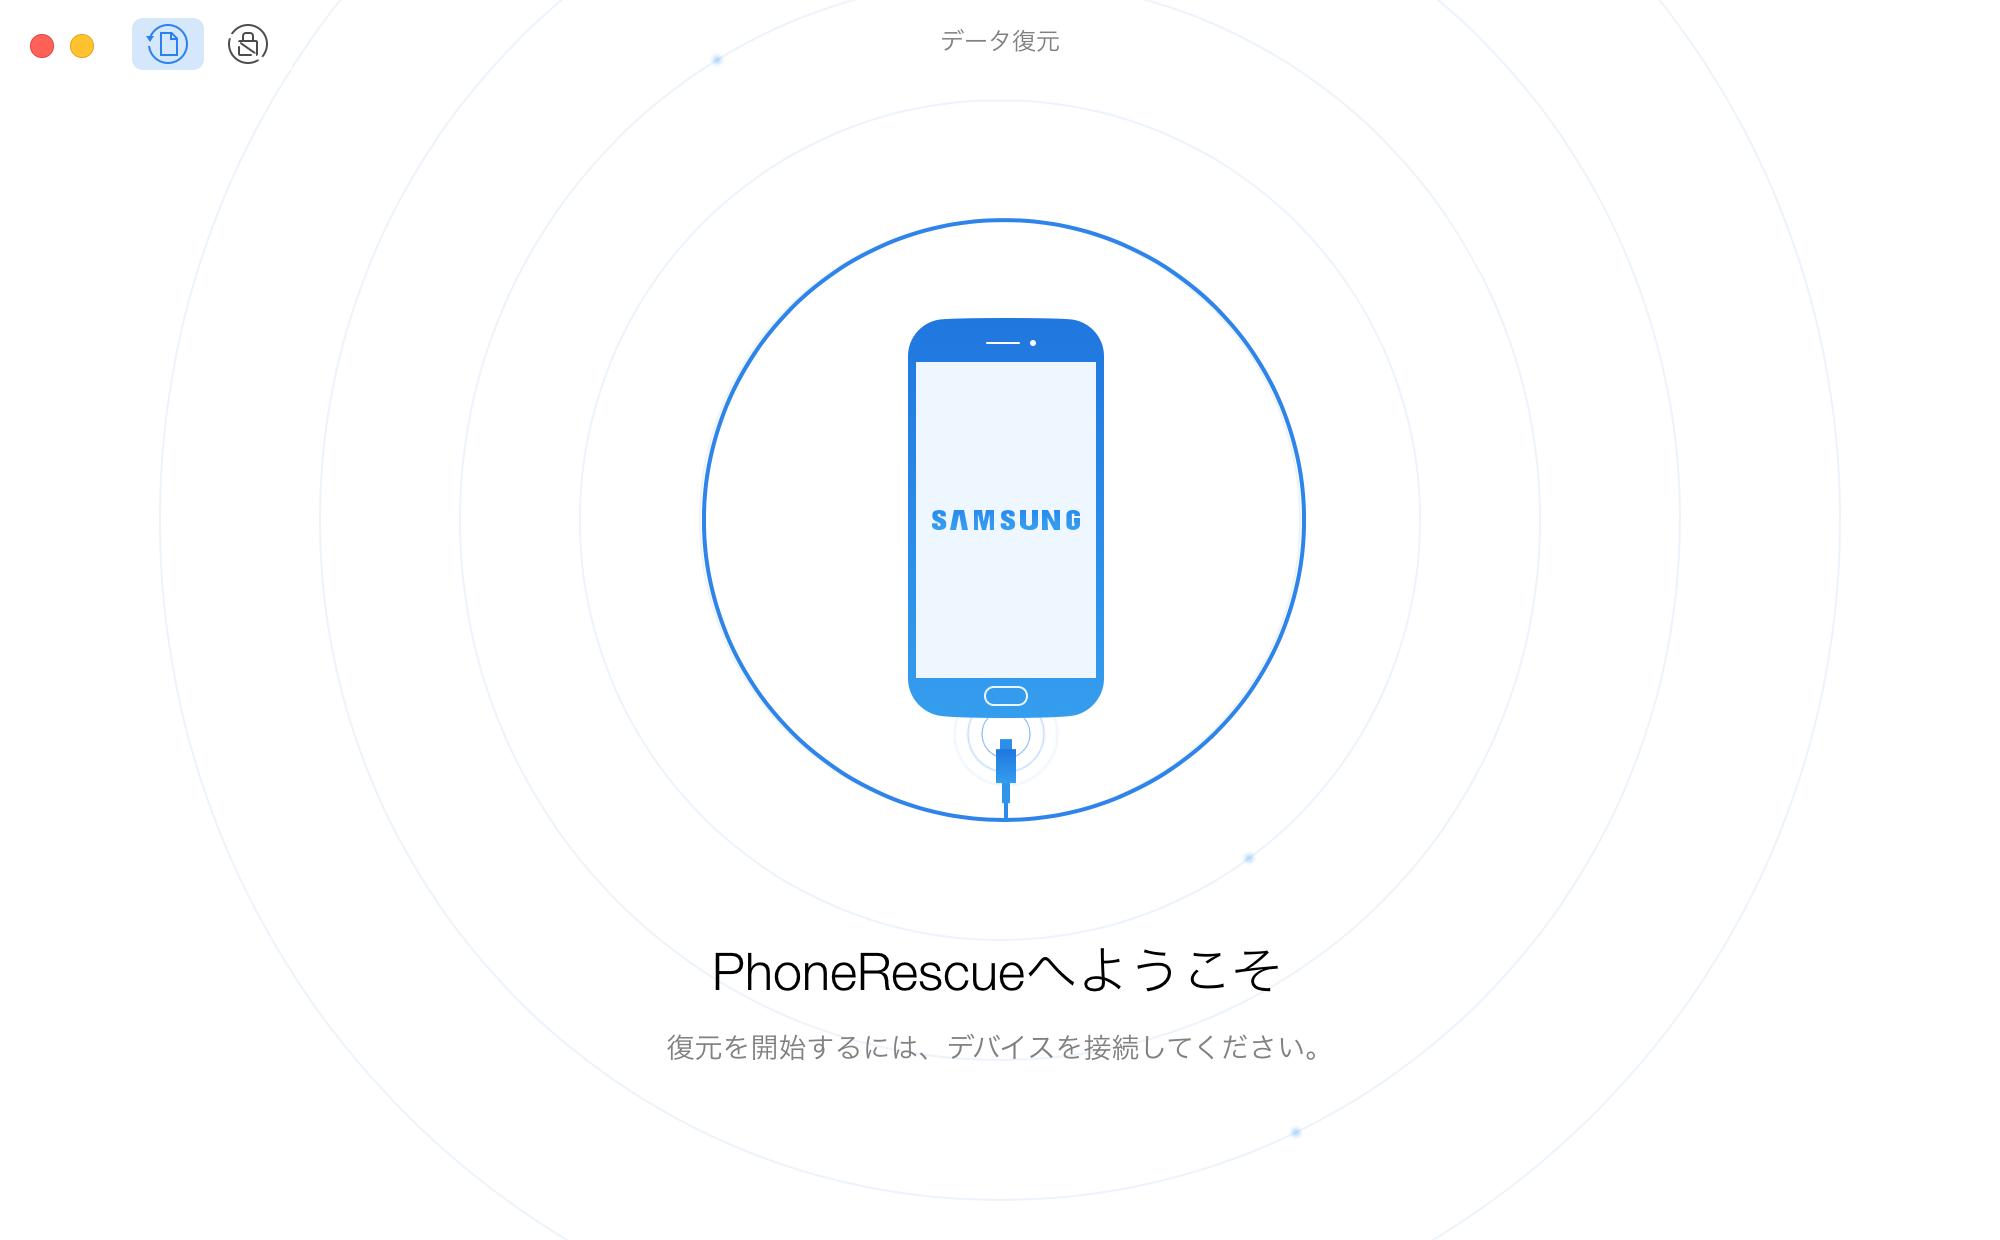 PhoneRescue - SAMSUNGデータ復元のウェルカムインターフェイス